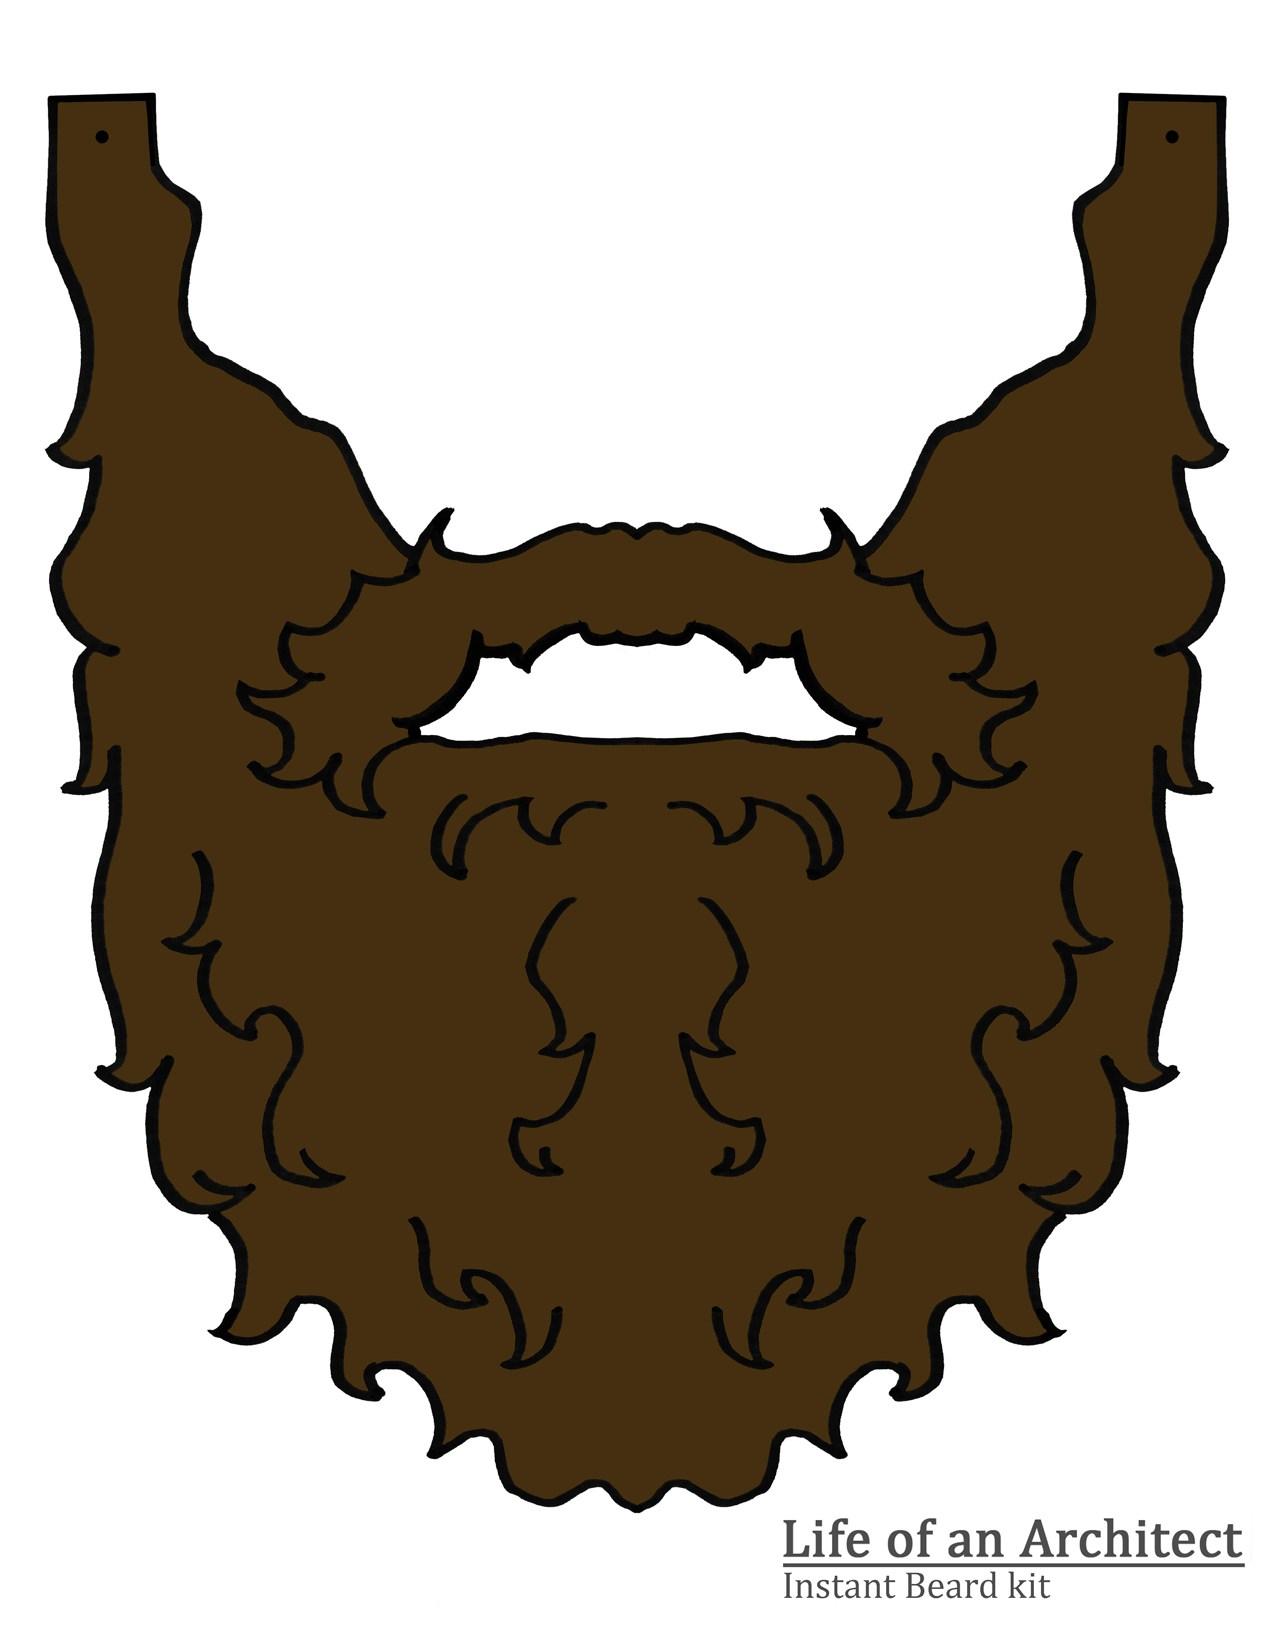 Beards of an architect. Beard clipart brown beard